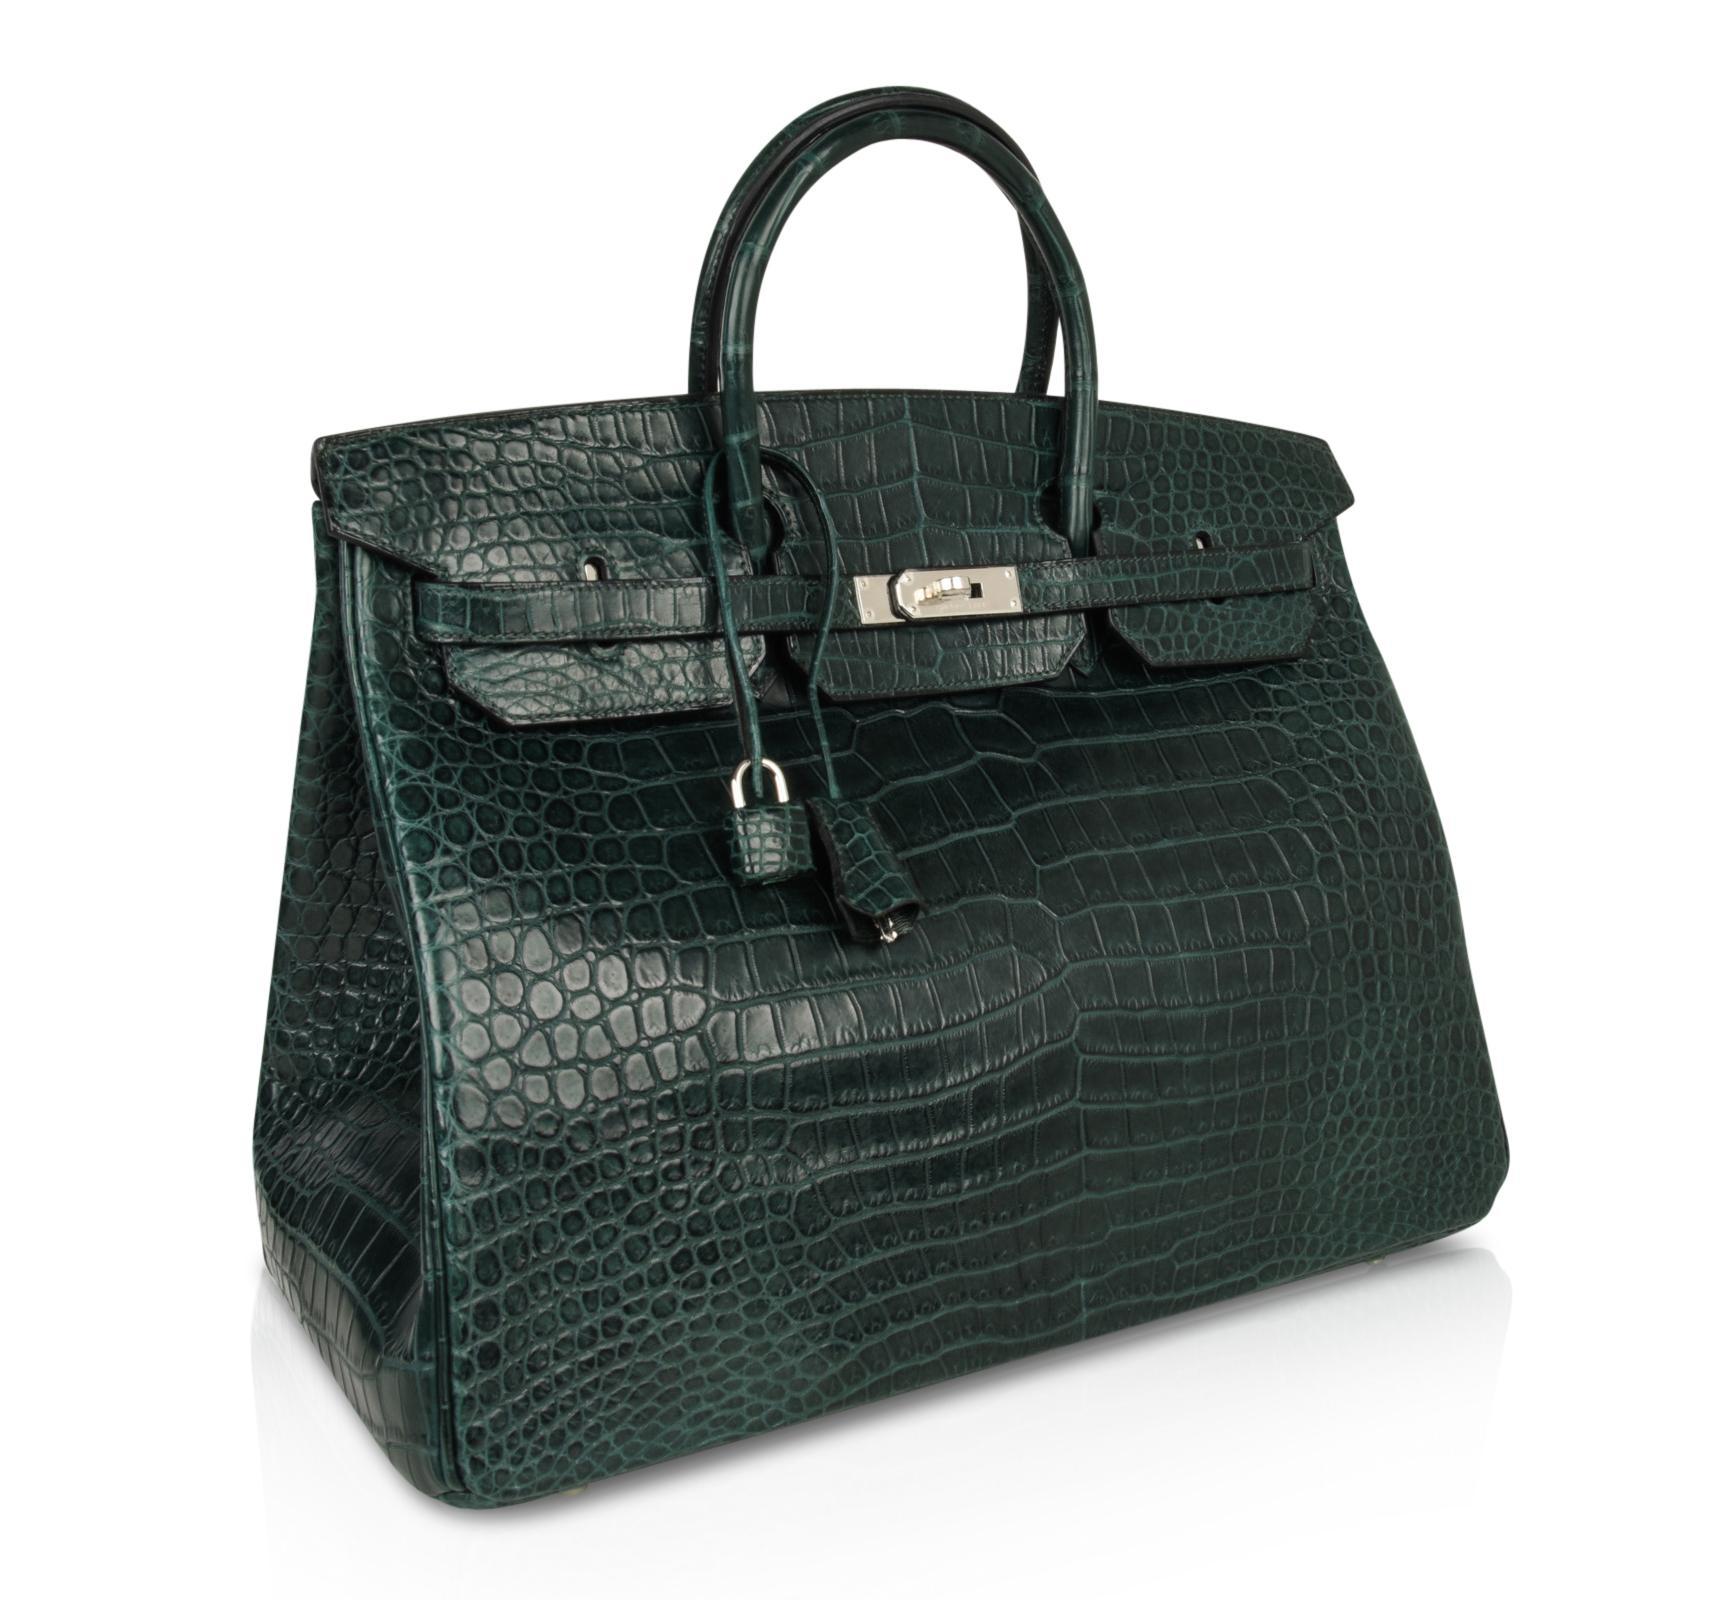 7 Star Replica Birkin Bag 40cm Vert Fonce Matte Porosus Crocodile Palladium Hardware Garland. TX – hermes replica bags most expensive ...